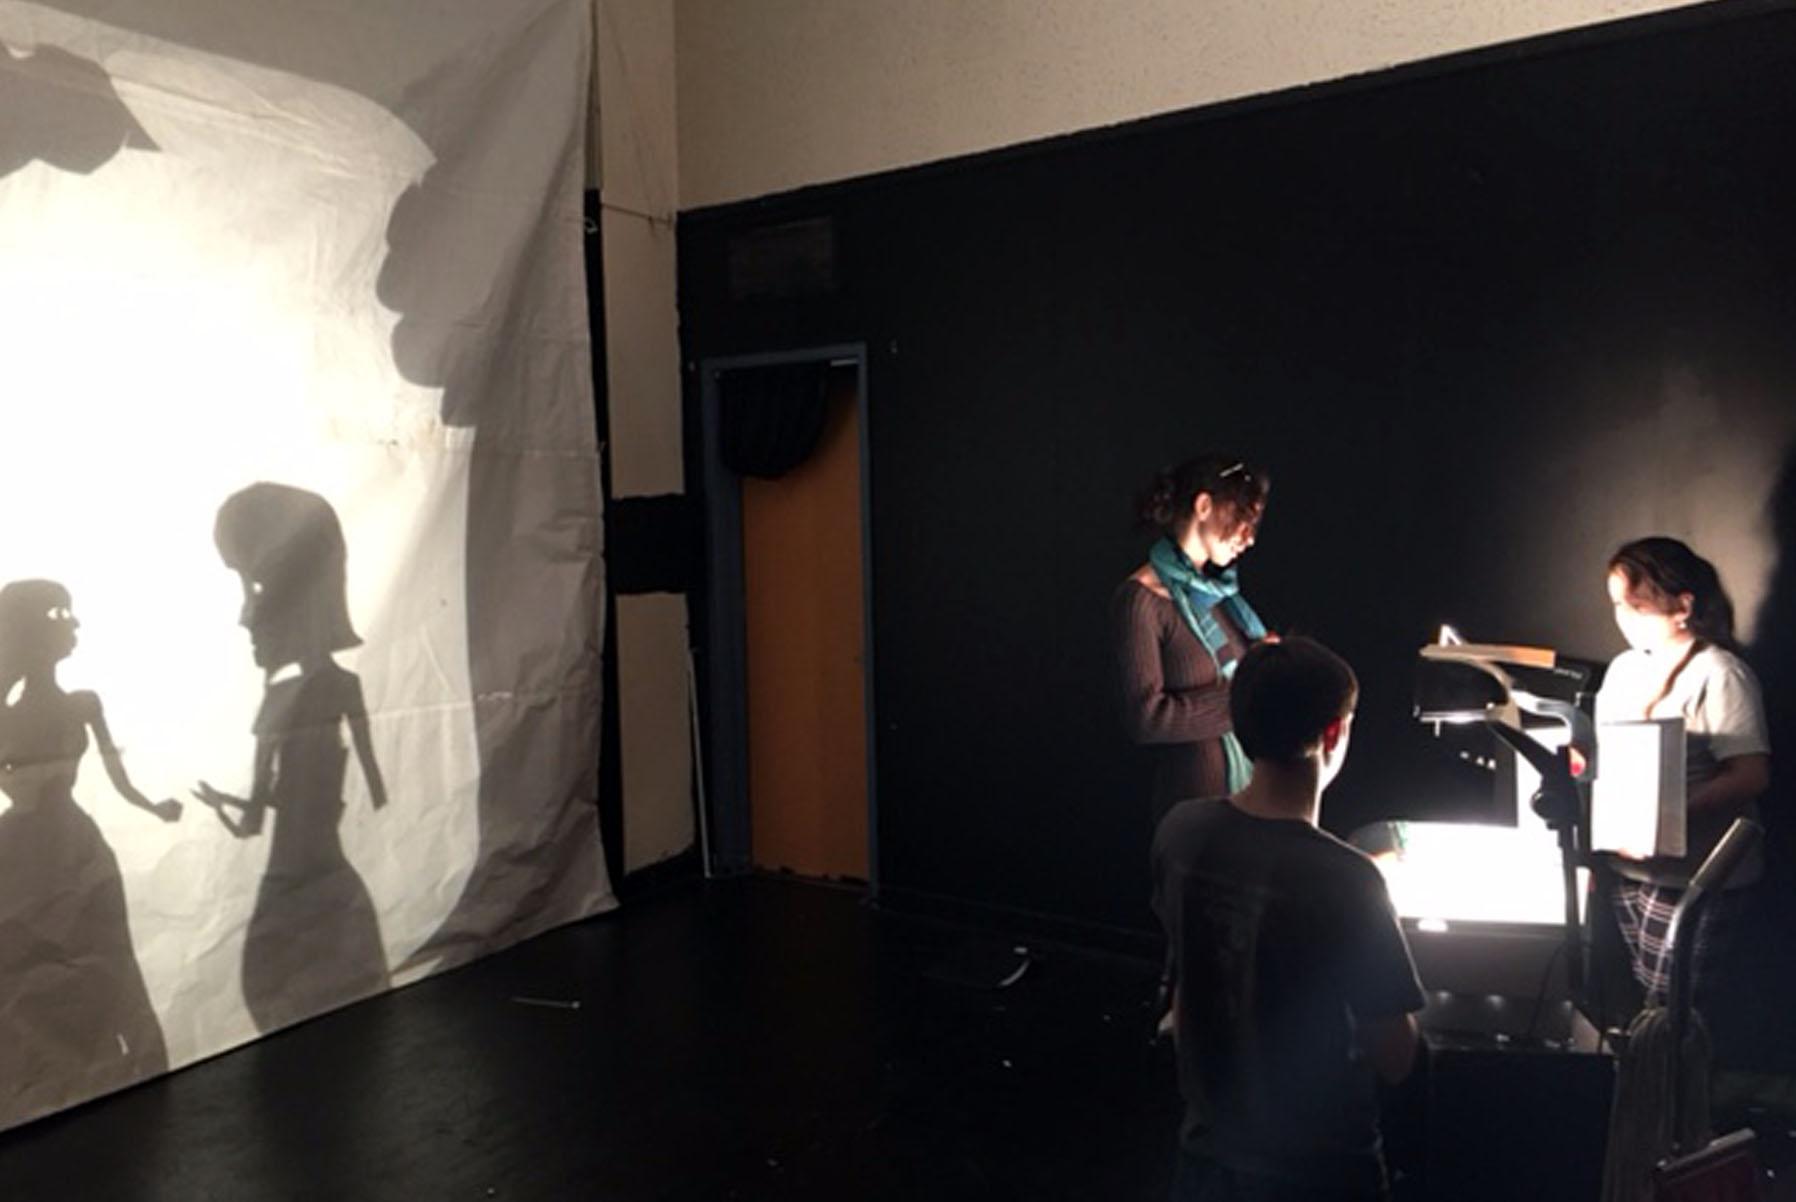 ShadowLight_photo2 copy.jpg